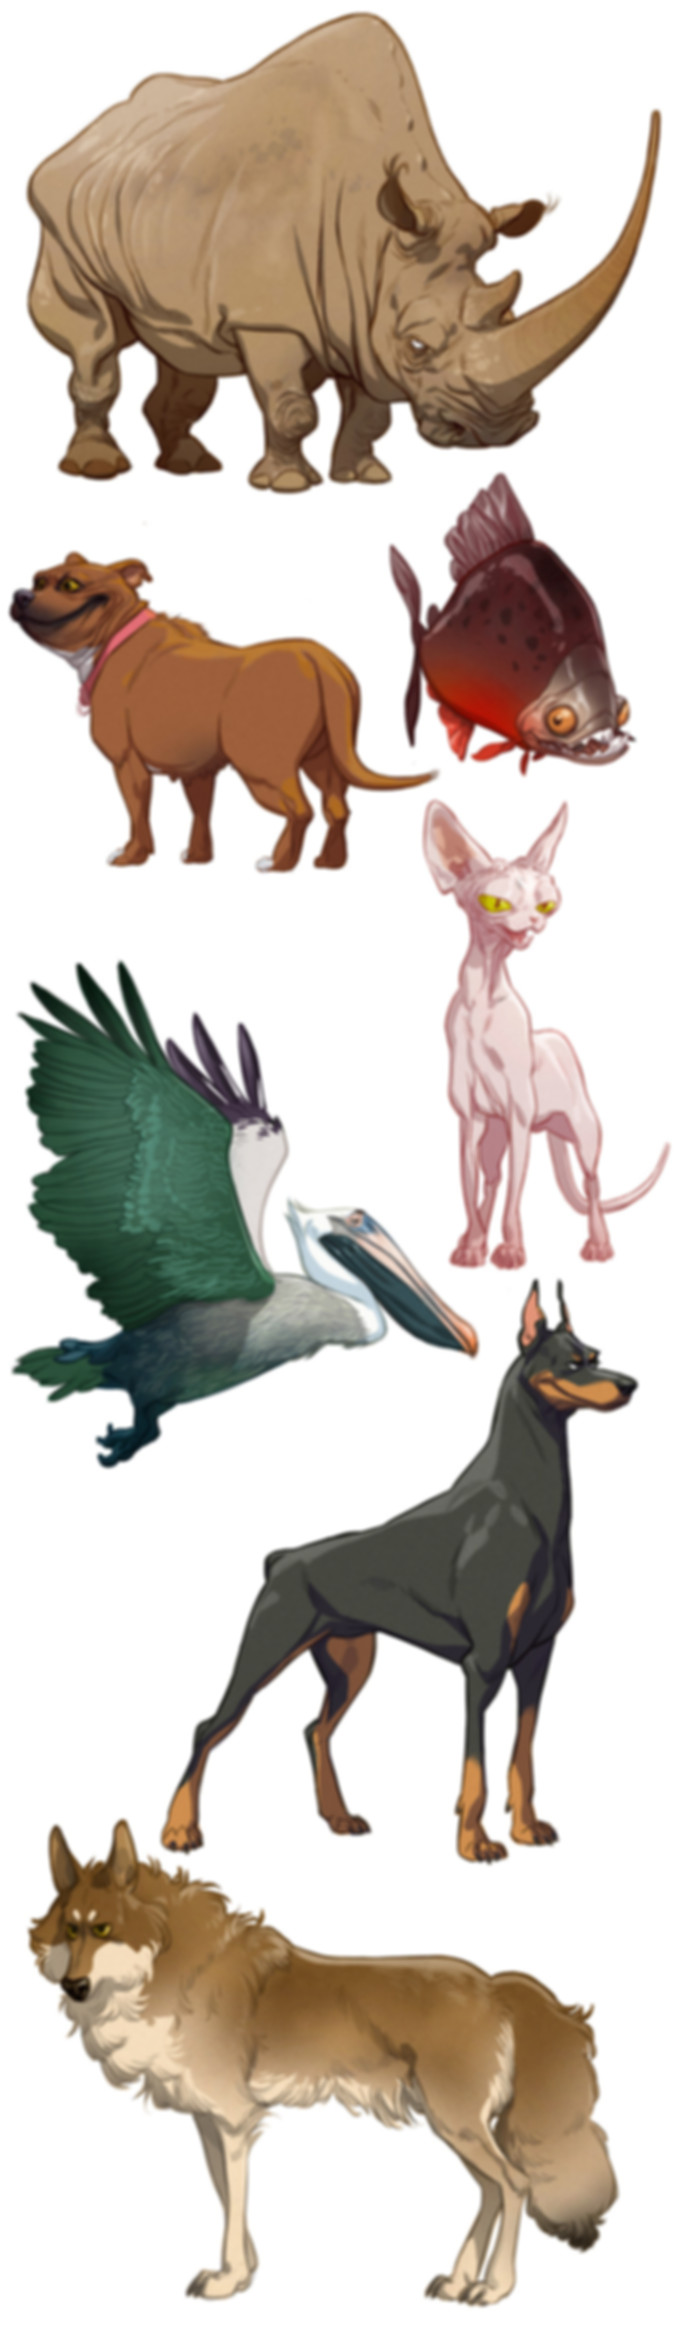 masters_of_anatomy_cartoon_animals_all_f